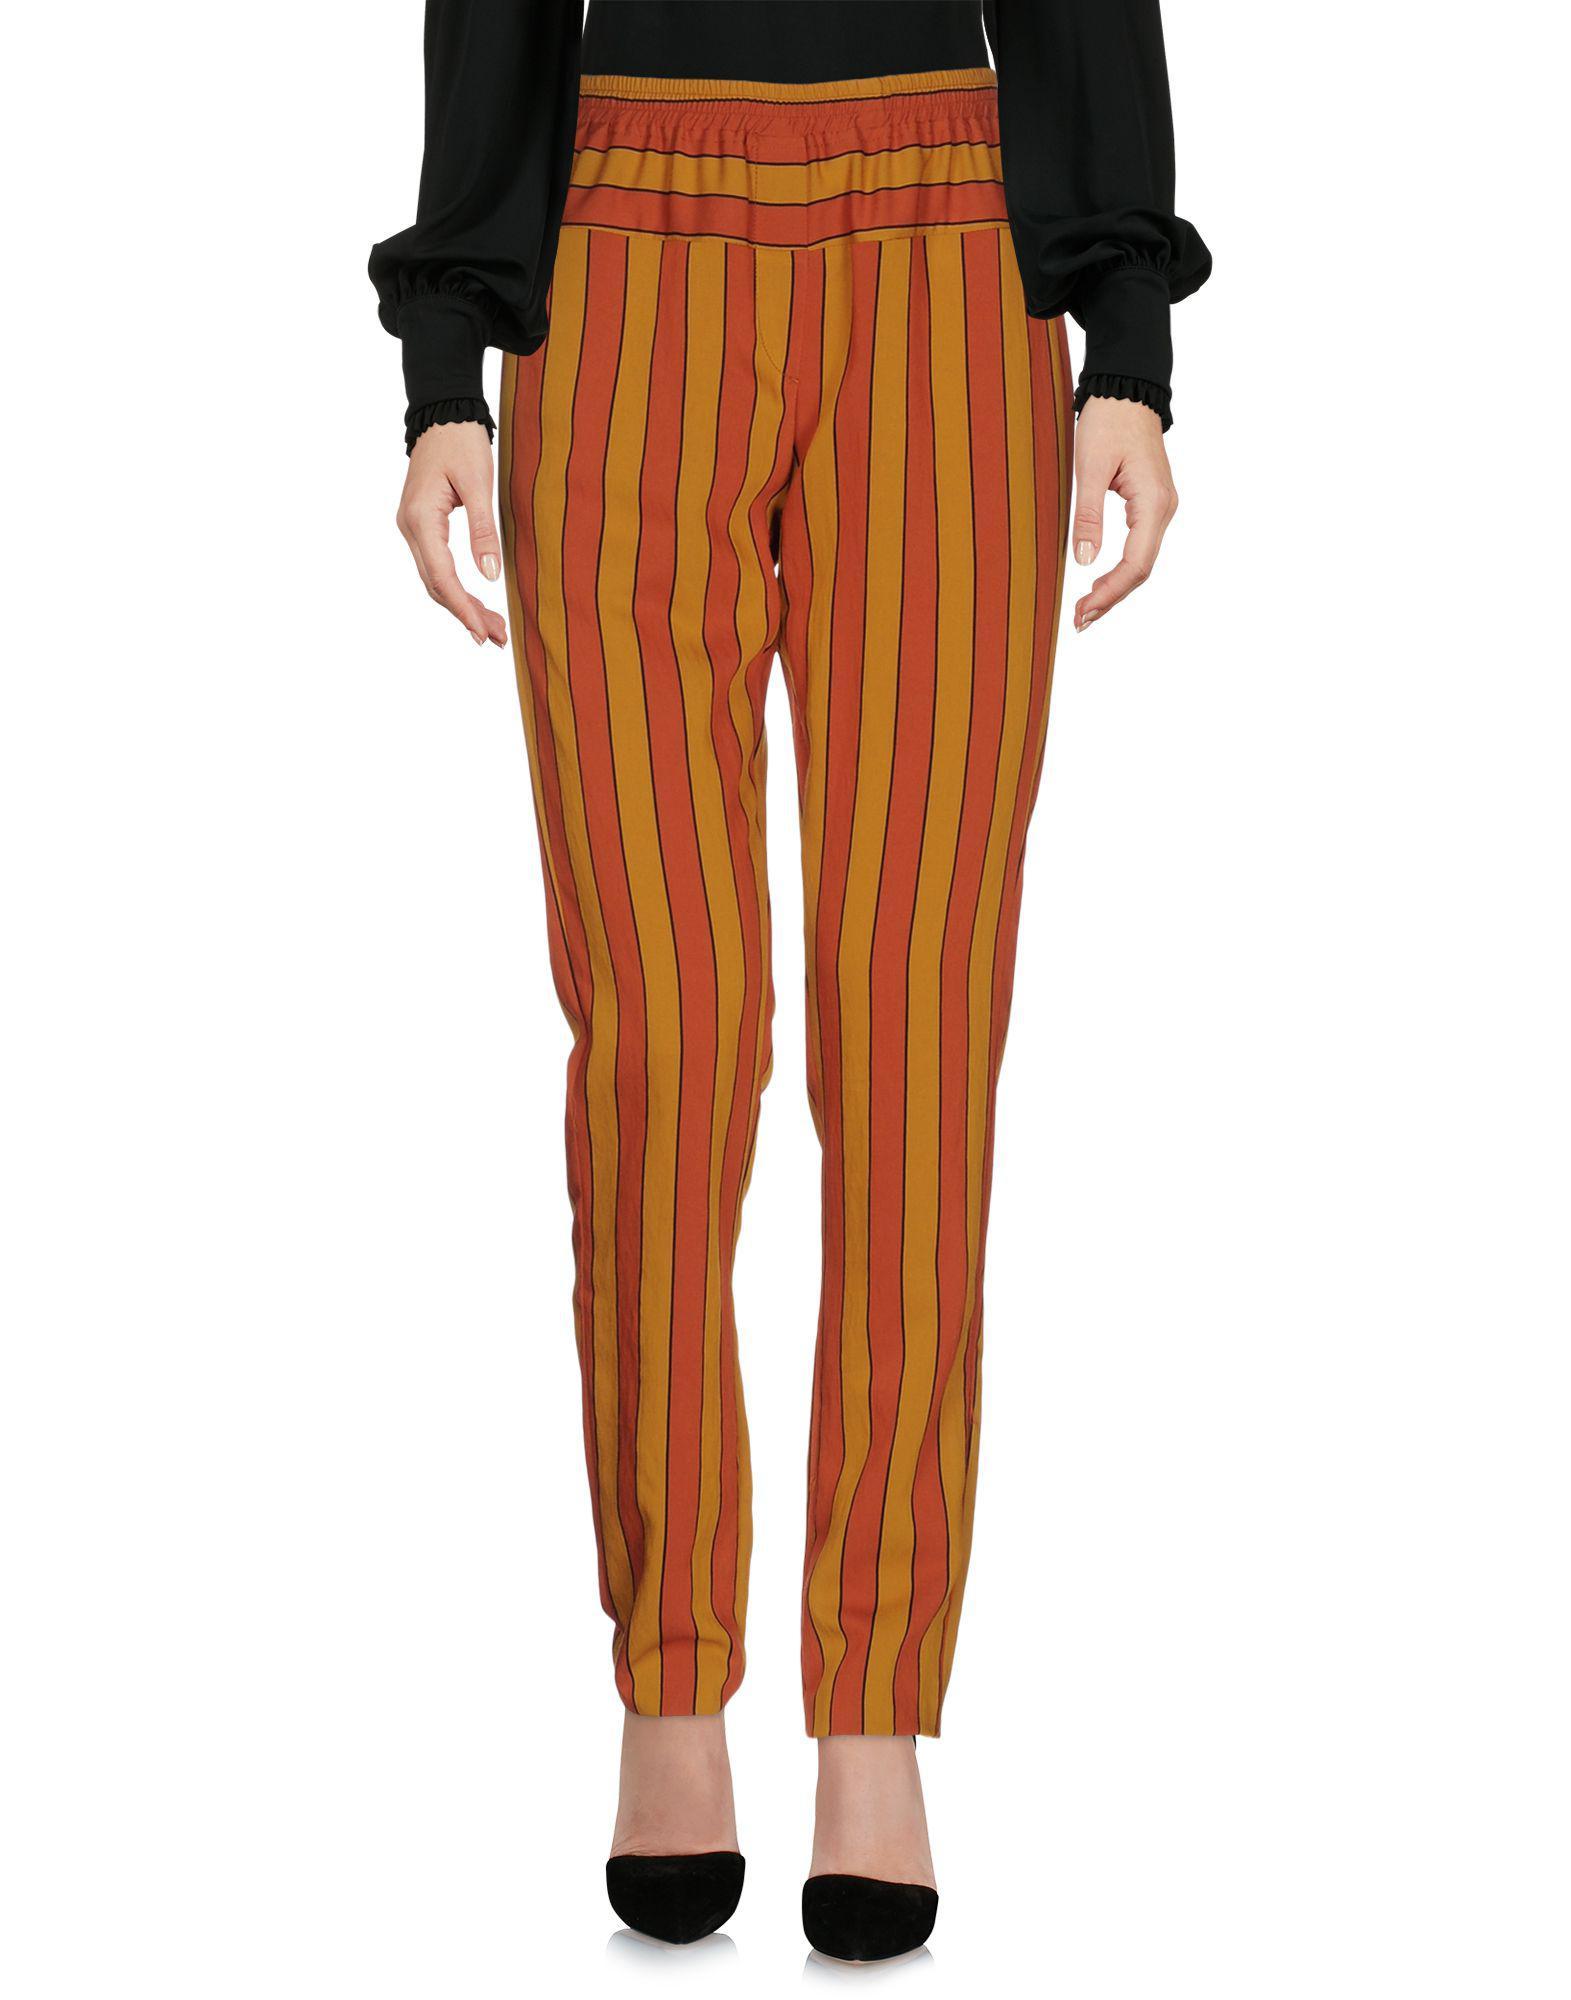 TROUSERS - Casual trousers Liis Japan bjZyD